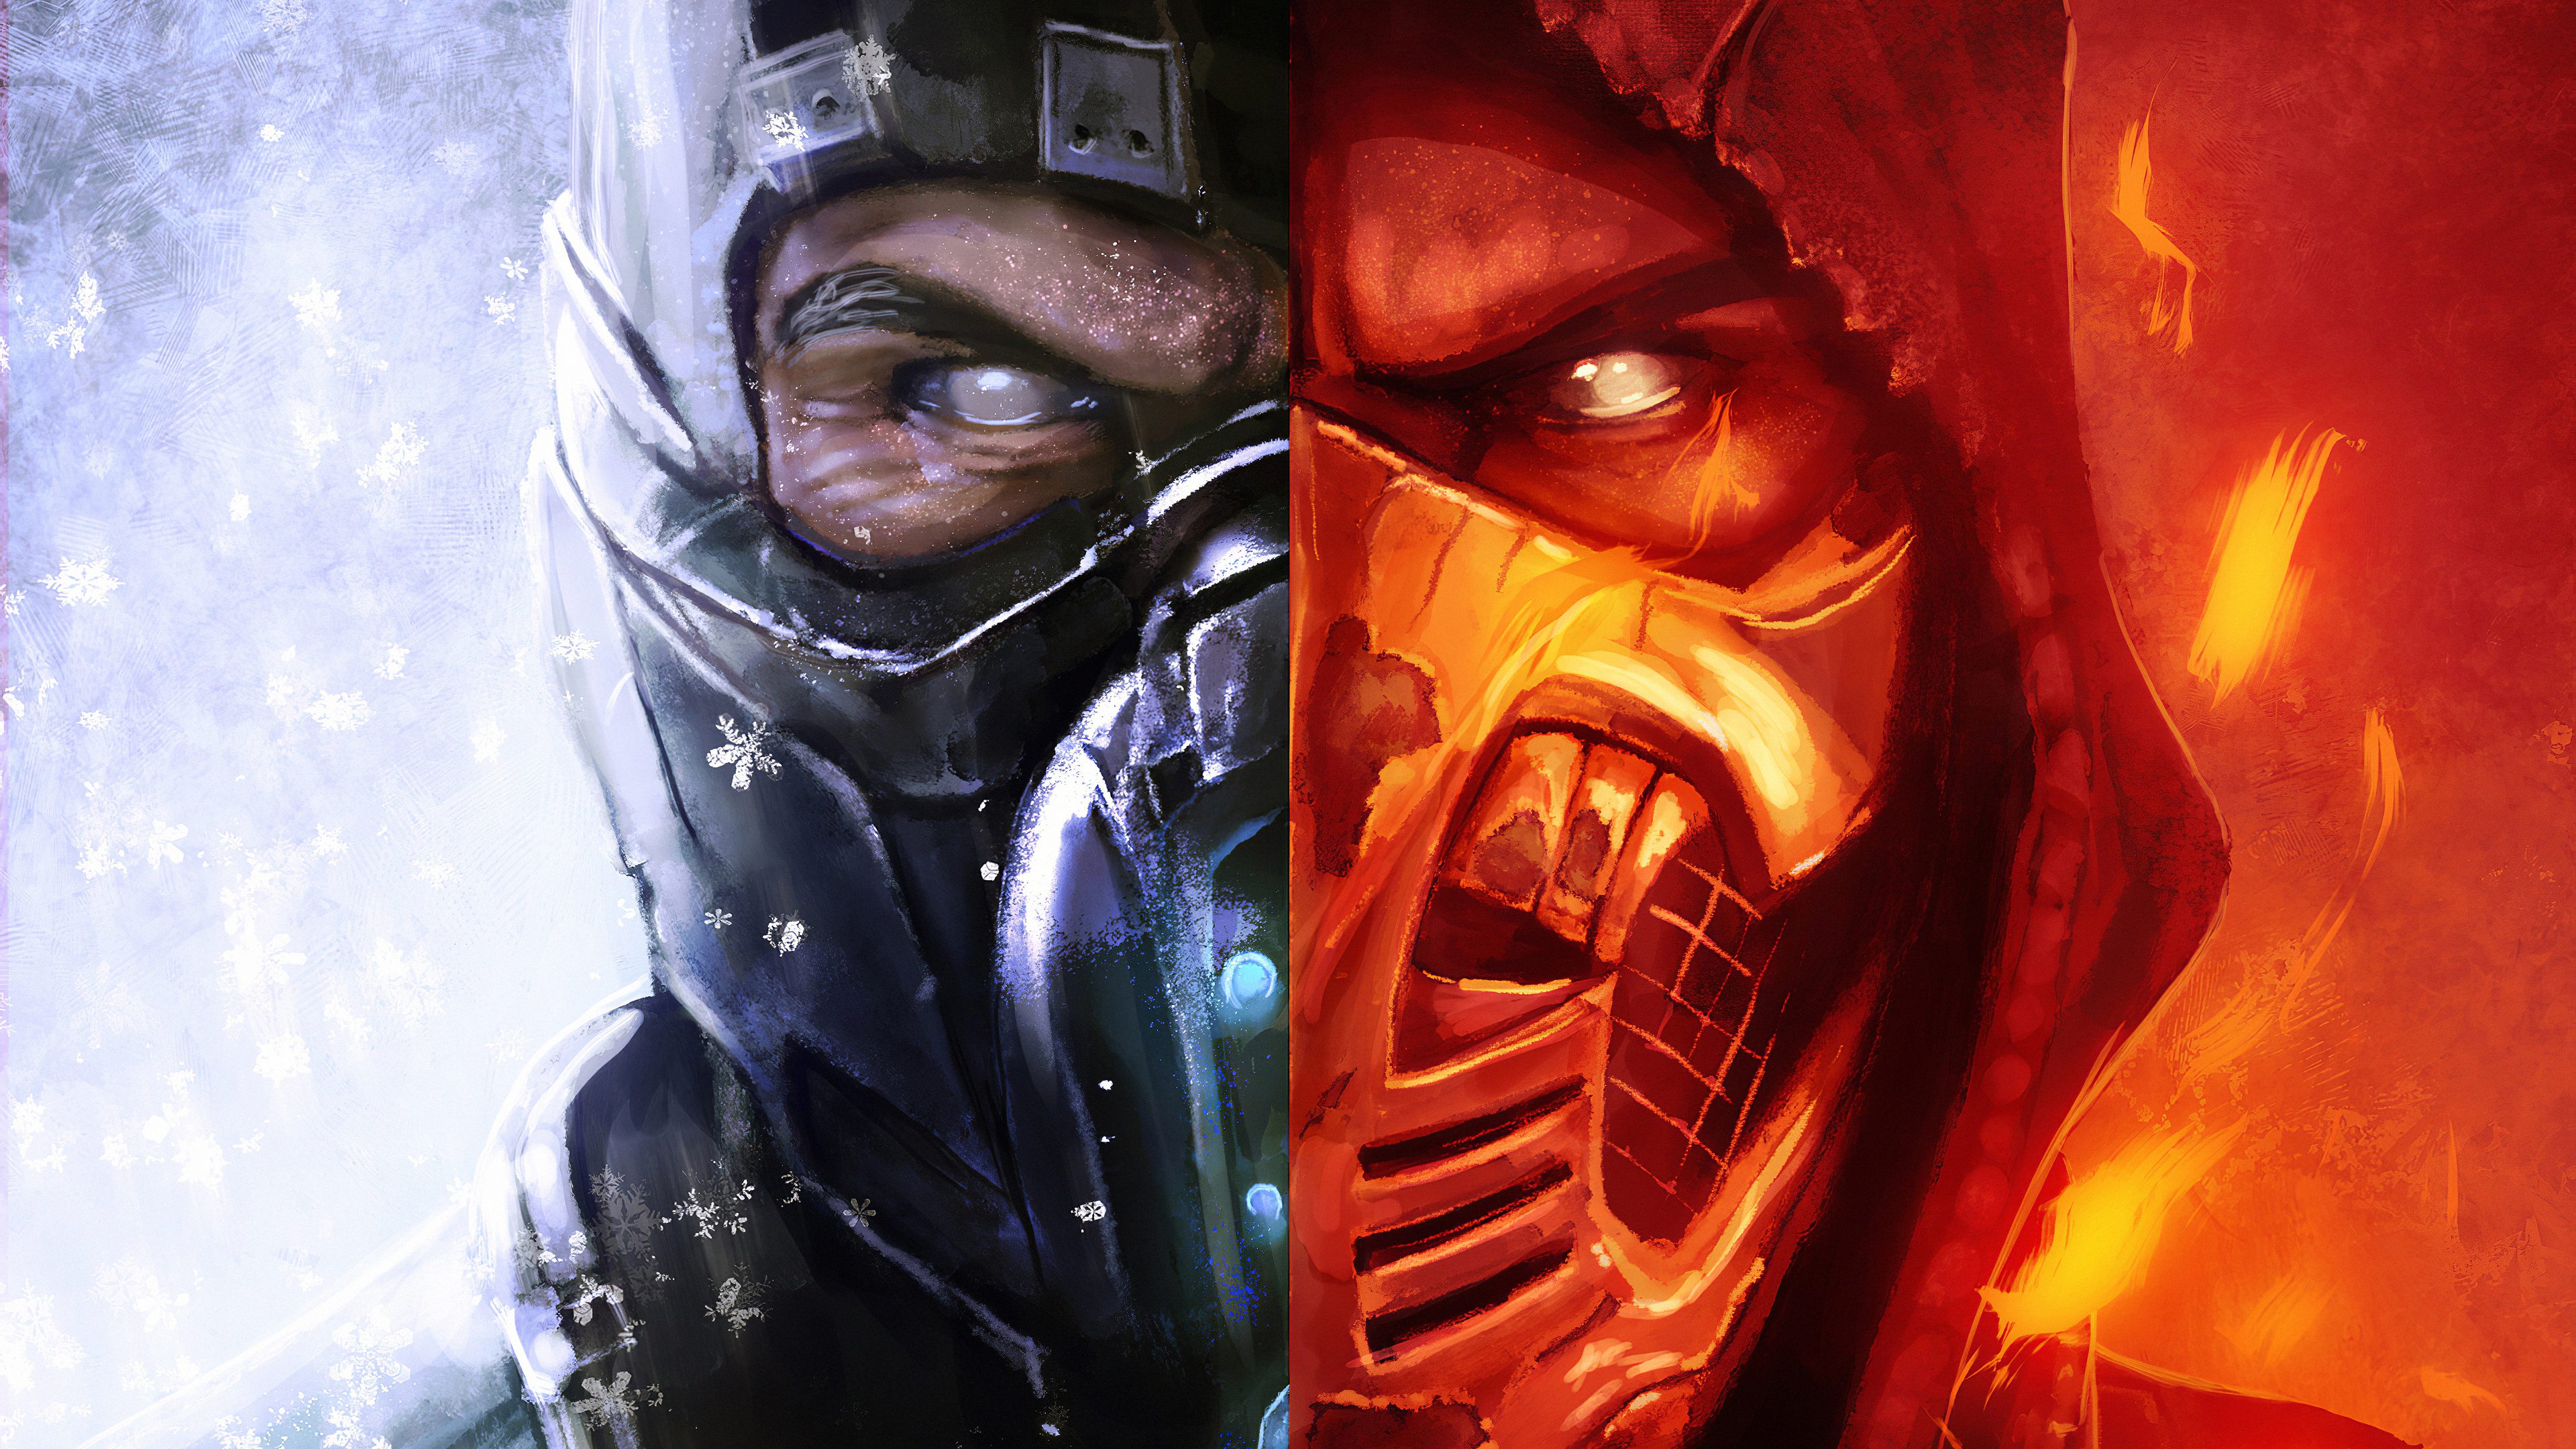 3840x2160 Scorpion Mortal Kombat X Art4k 4k HD 4k ...